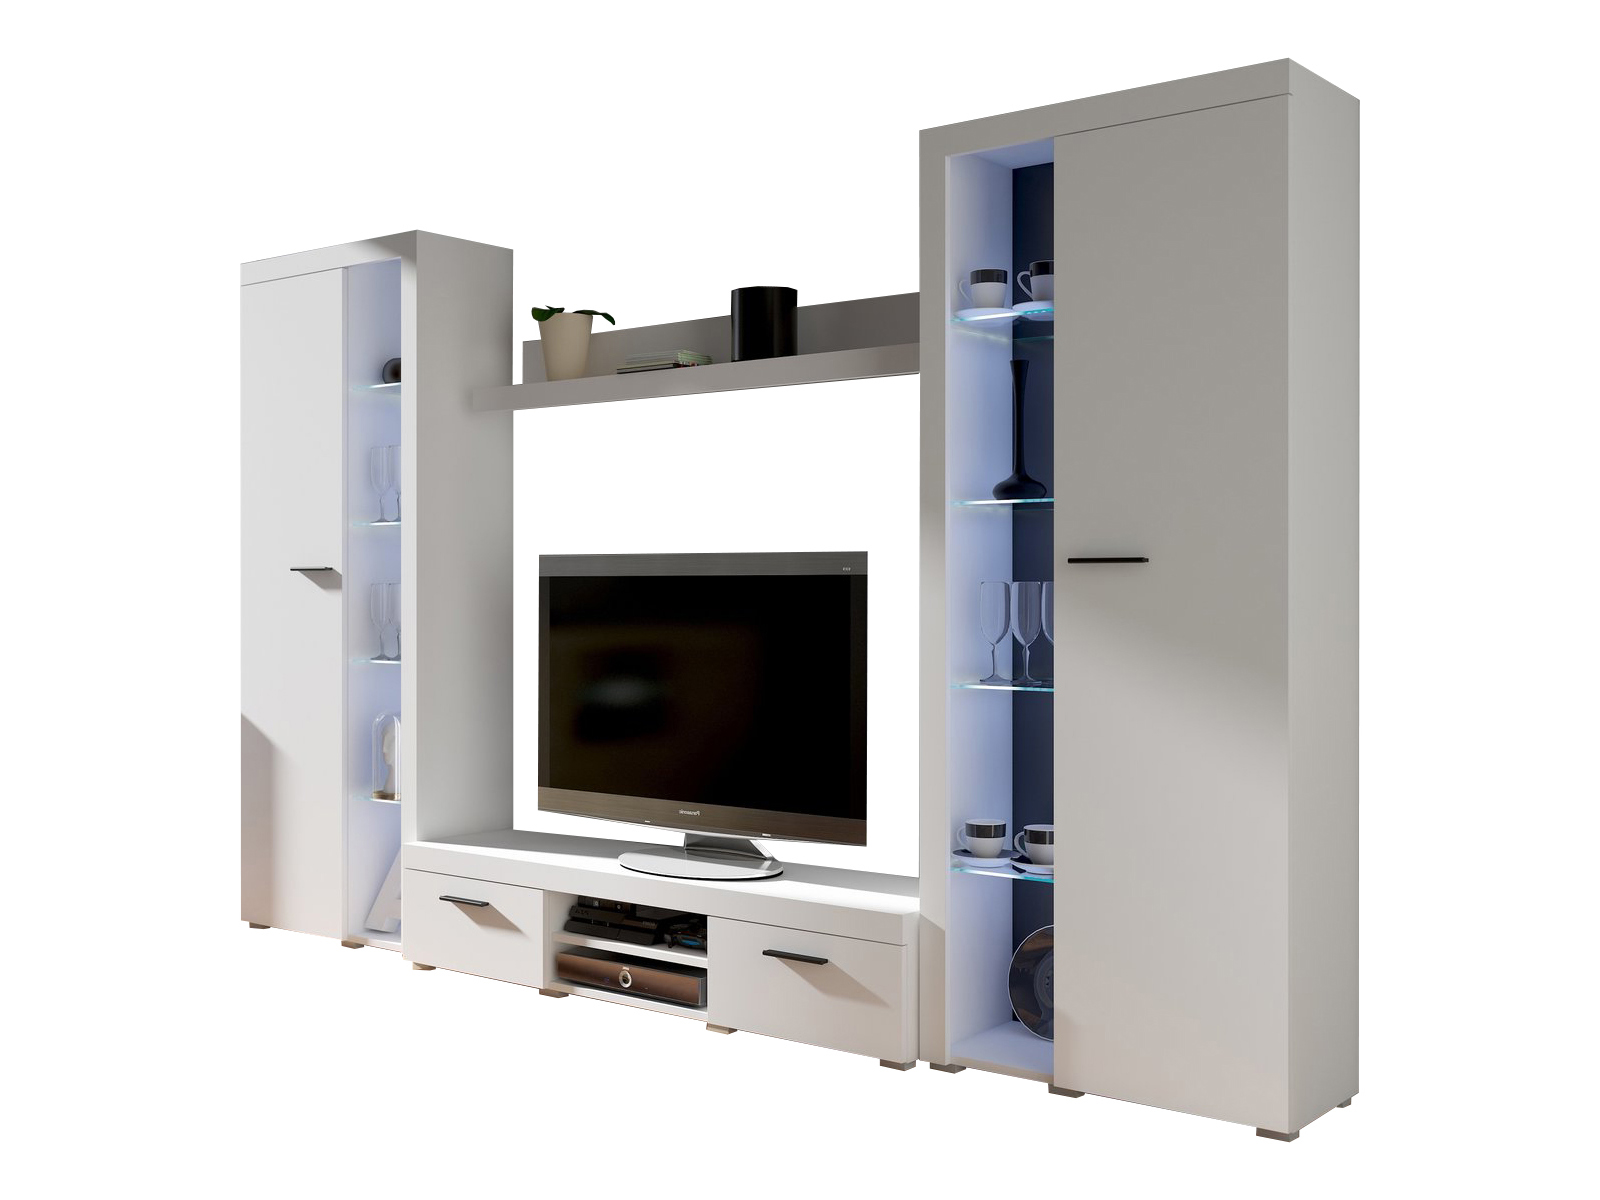 Obývací stěna - Rudby XL (bílá)